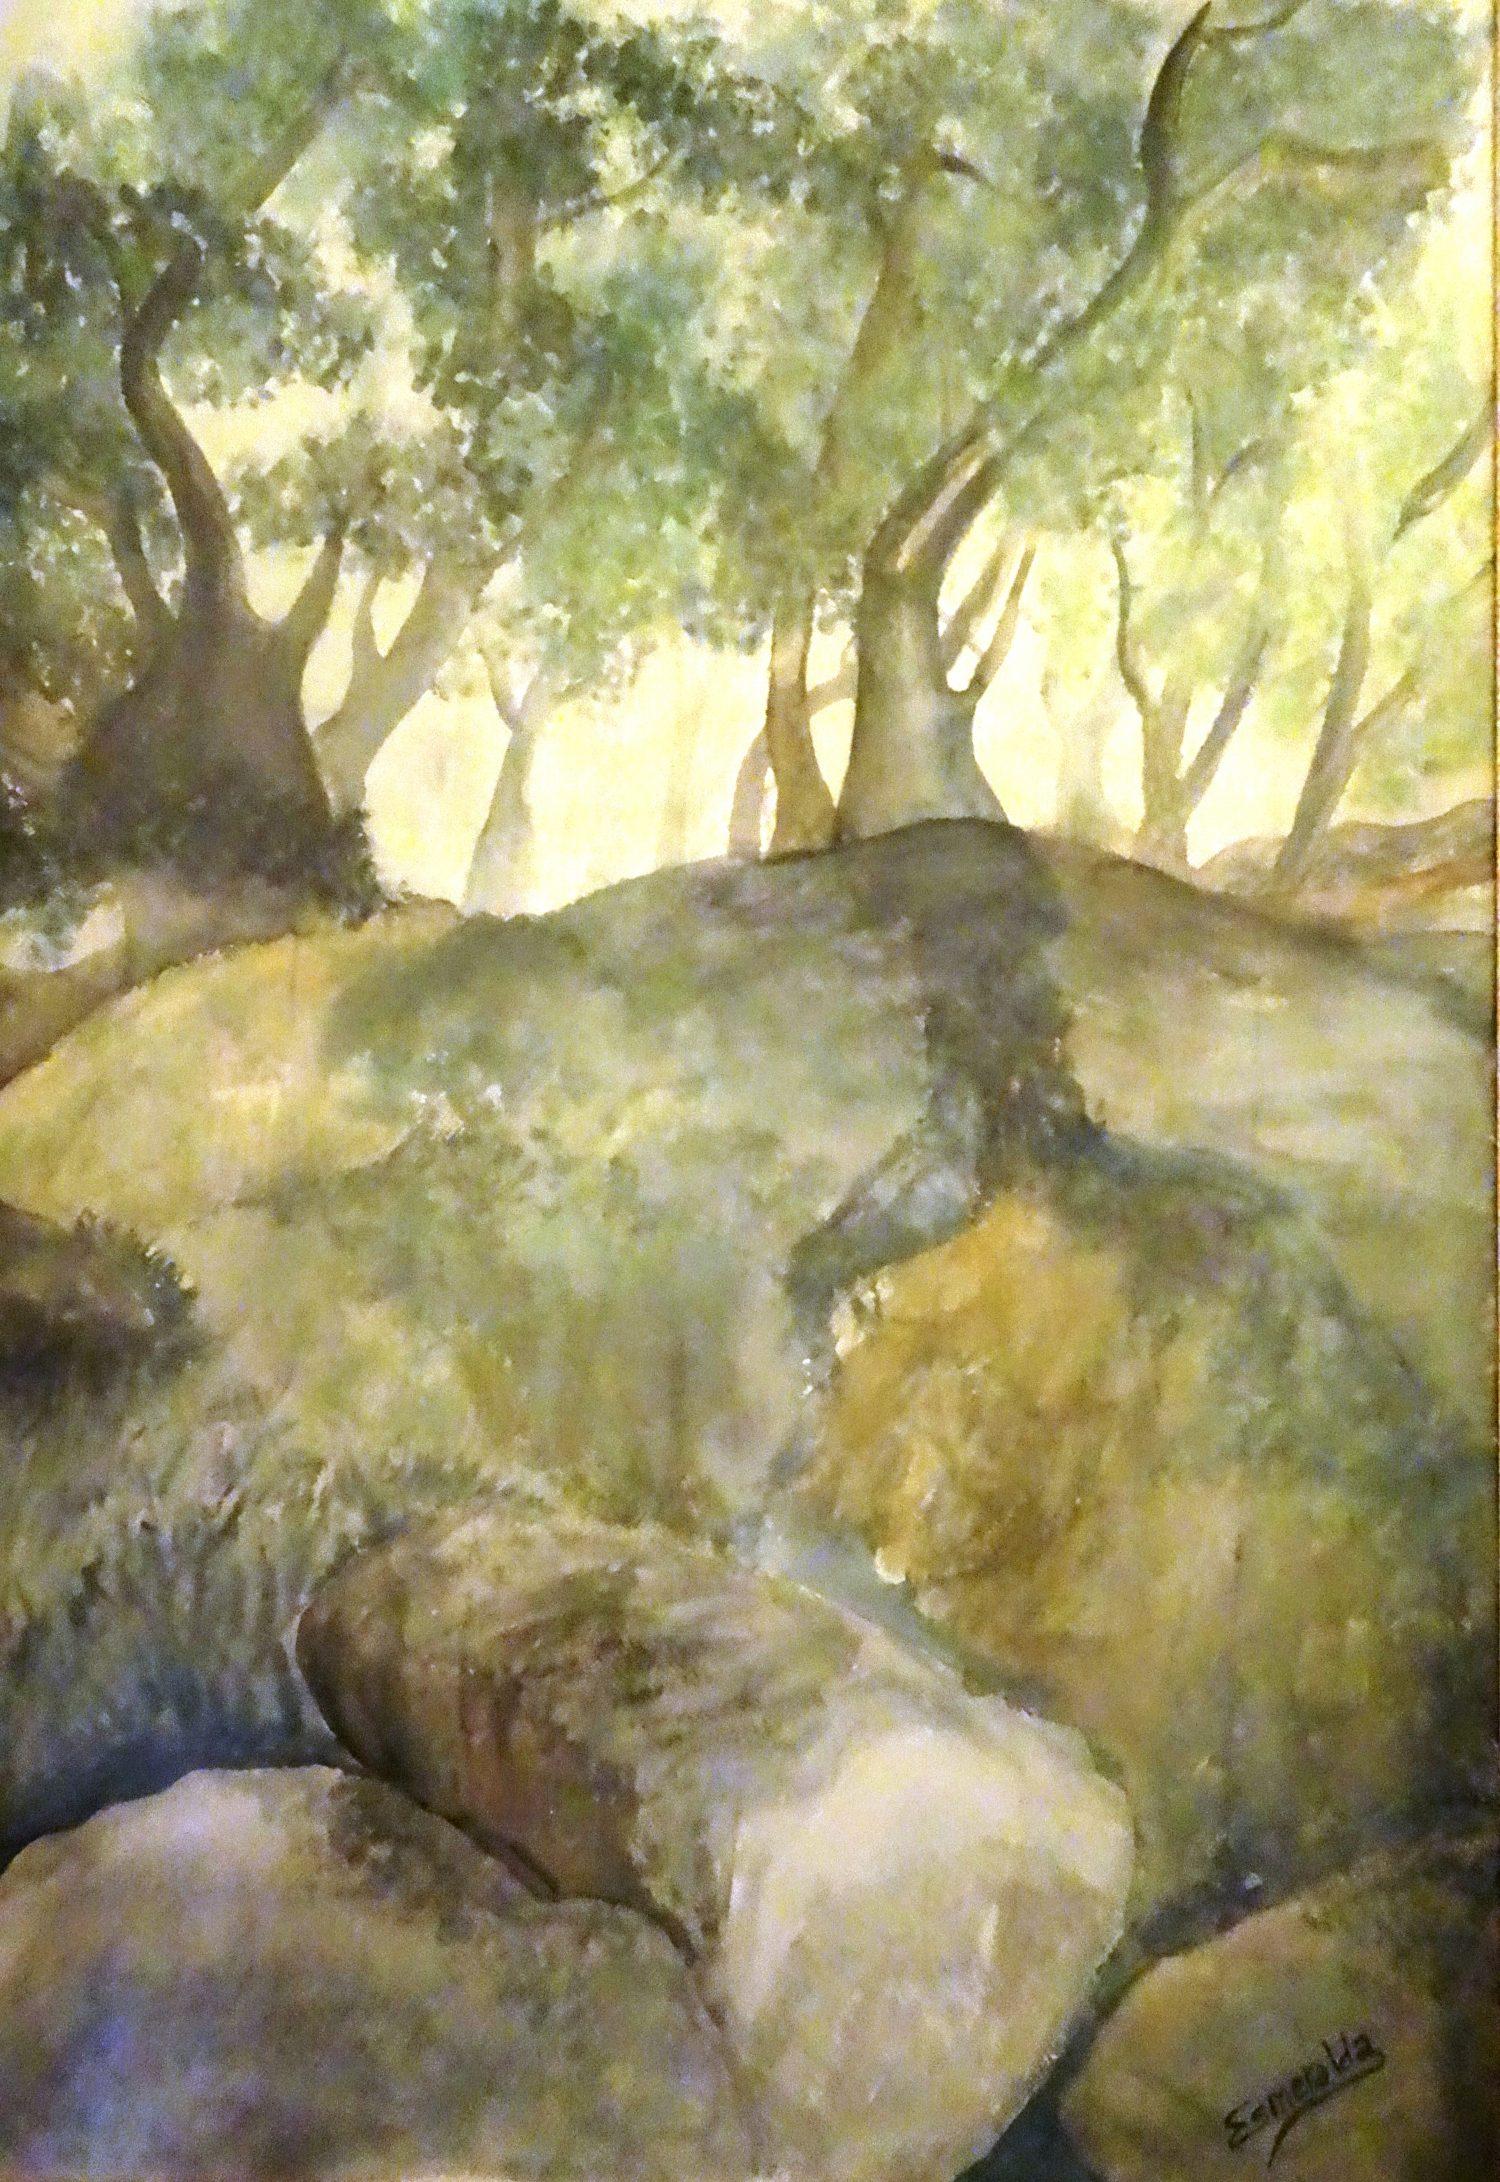 Acuarela 120 x 70 cm, titulada Gnomos Escondidos de Esmeralda